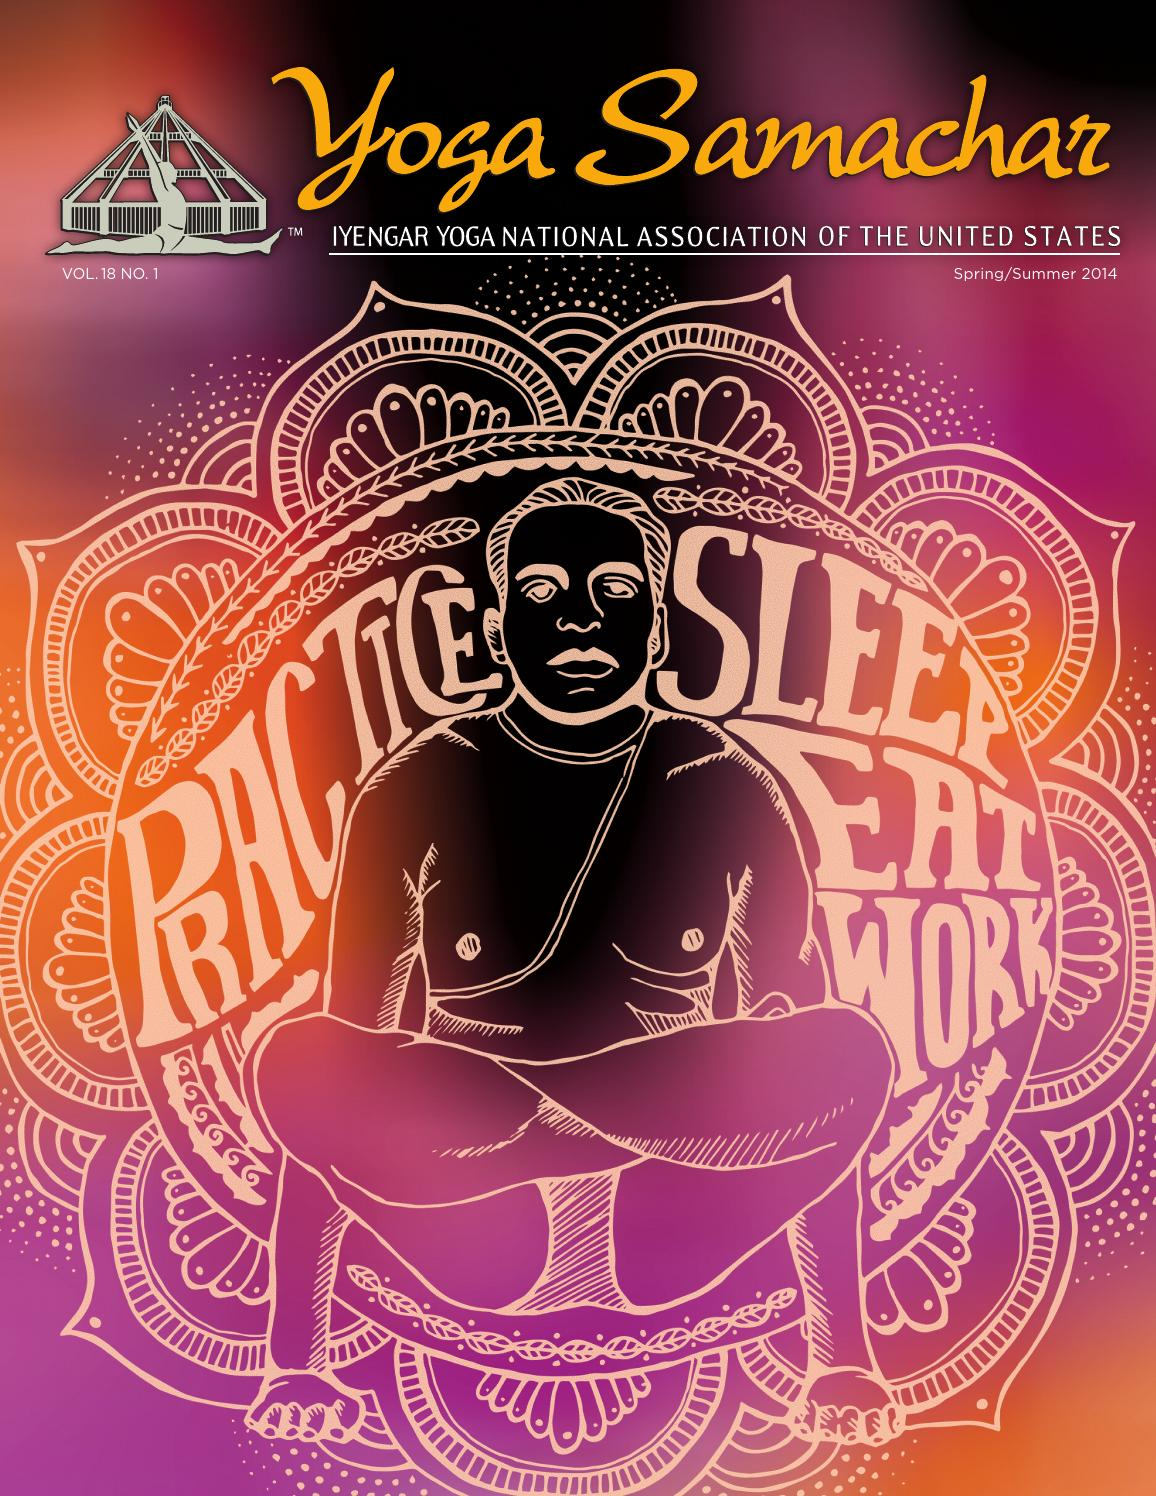 Yoga Samachar Spring Summer2014 By Don Gura Graphic Design Inc Issuu